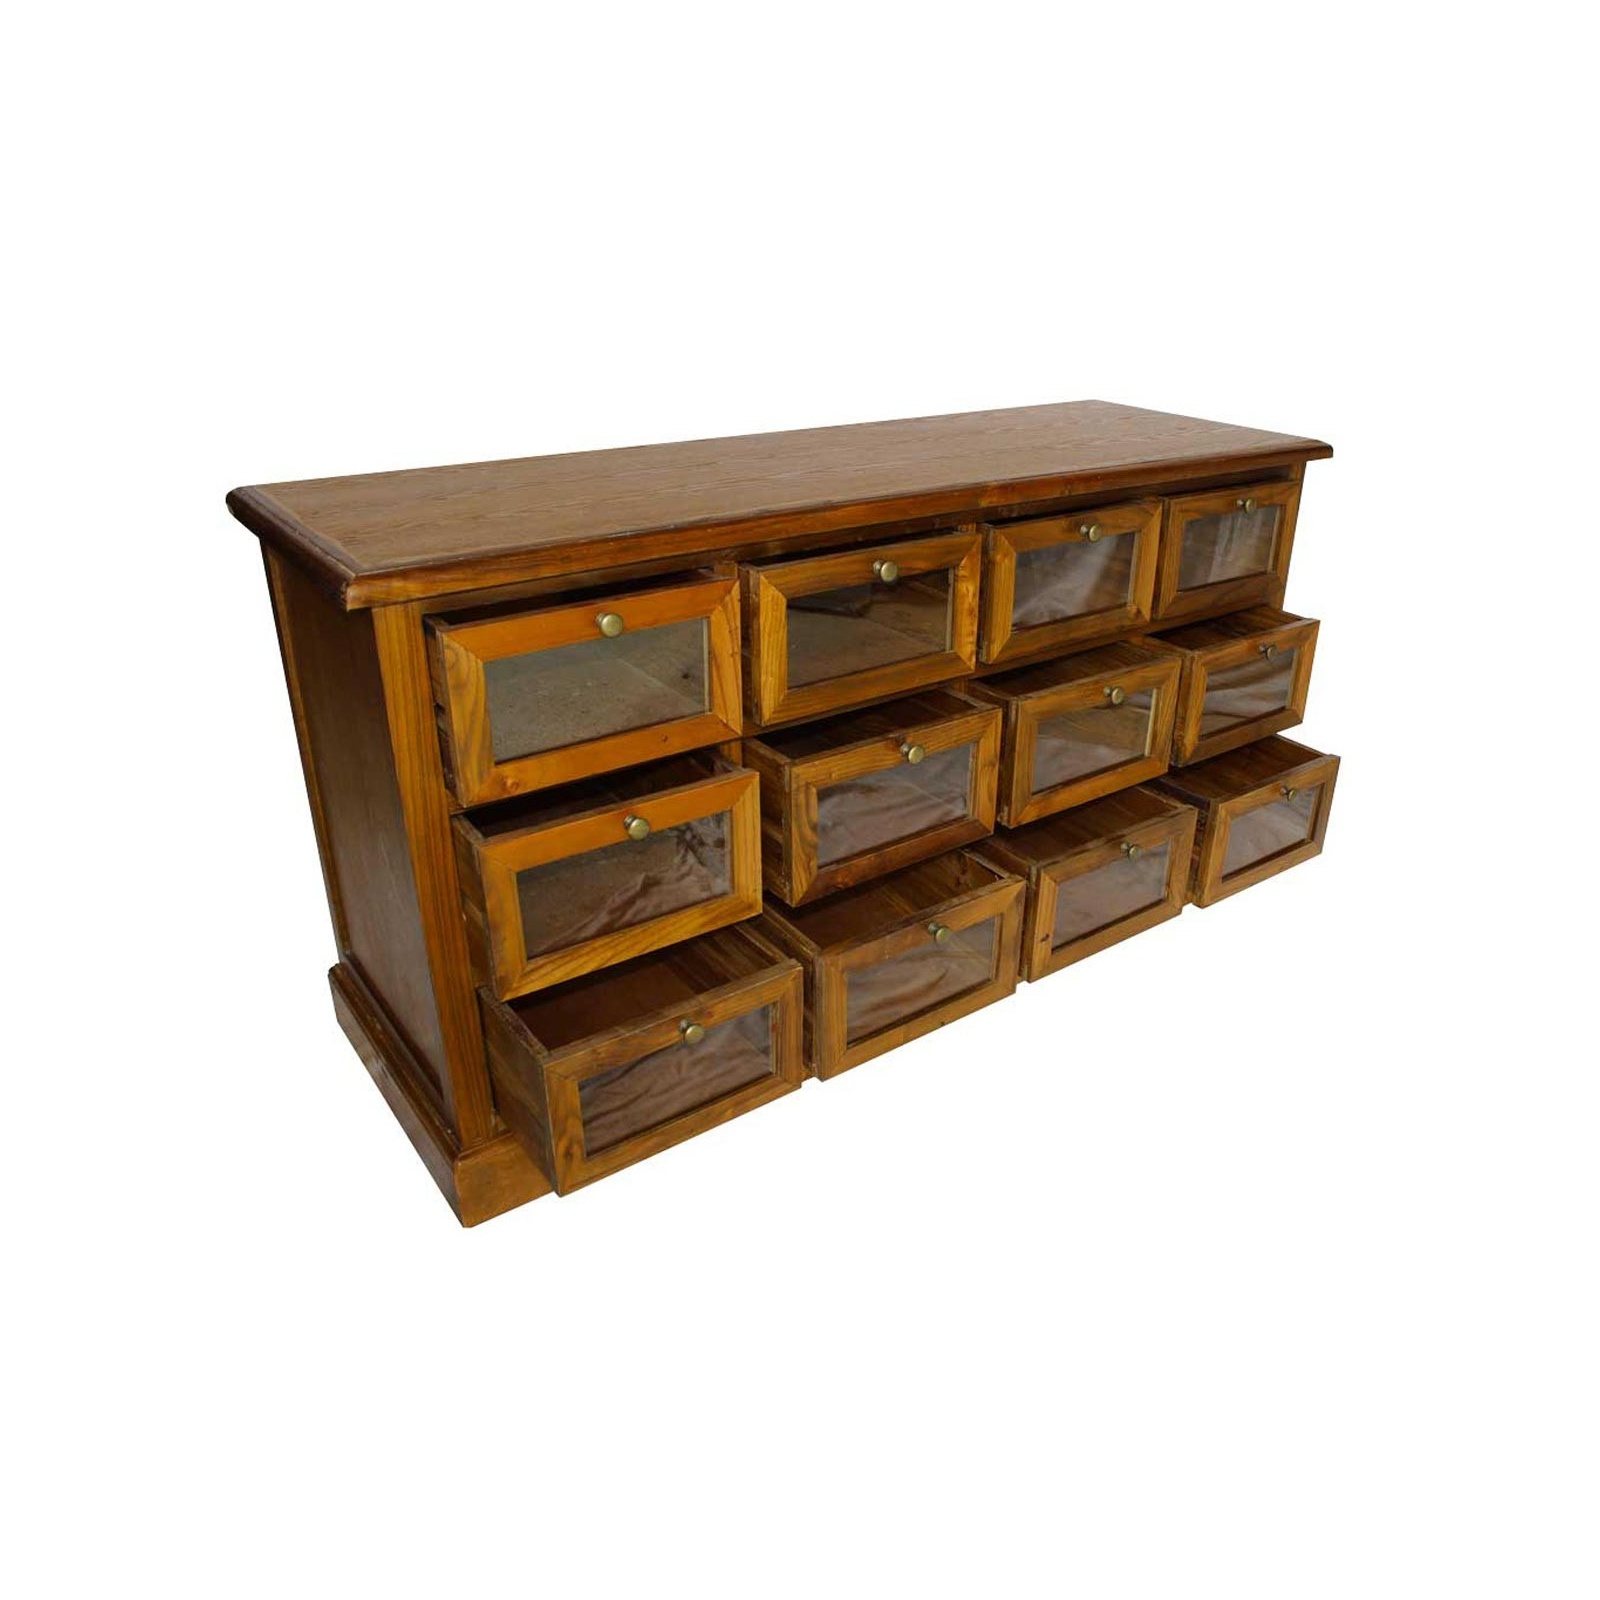 chiffonnier vitr jp2b d coration. Black Bedroom Furniture Sets. Home Design Ideas